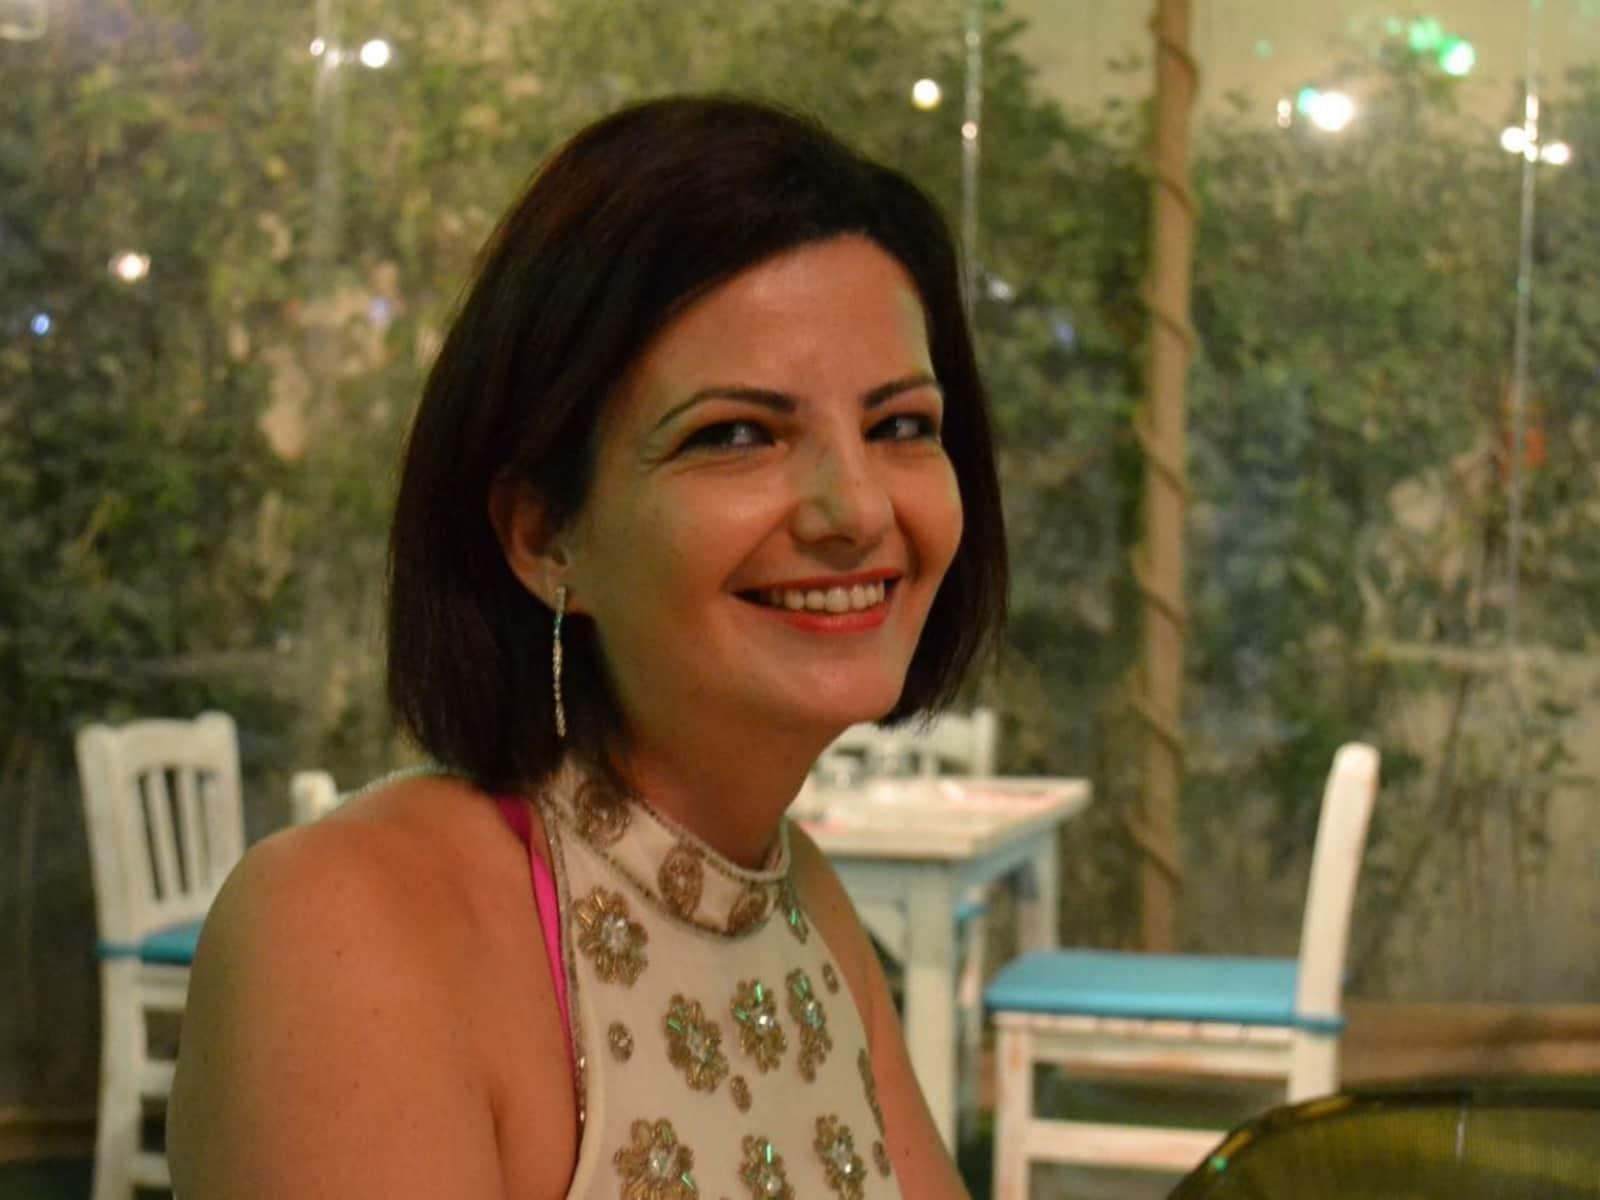 Maha from Dubai International Financial Centre, United Arab Emirates